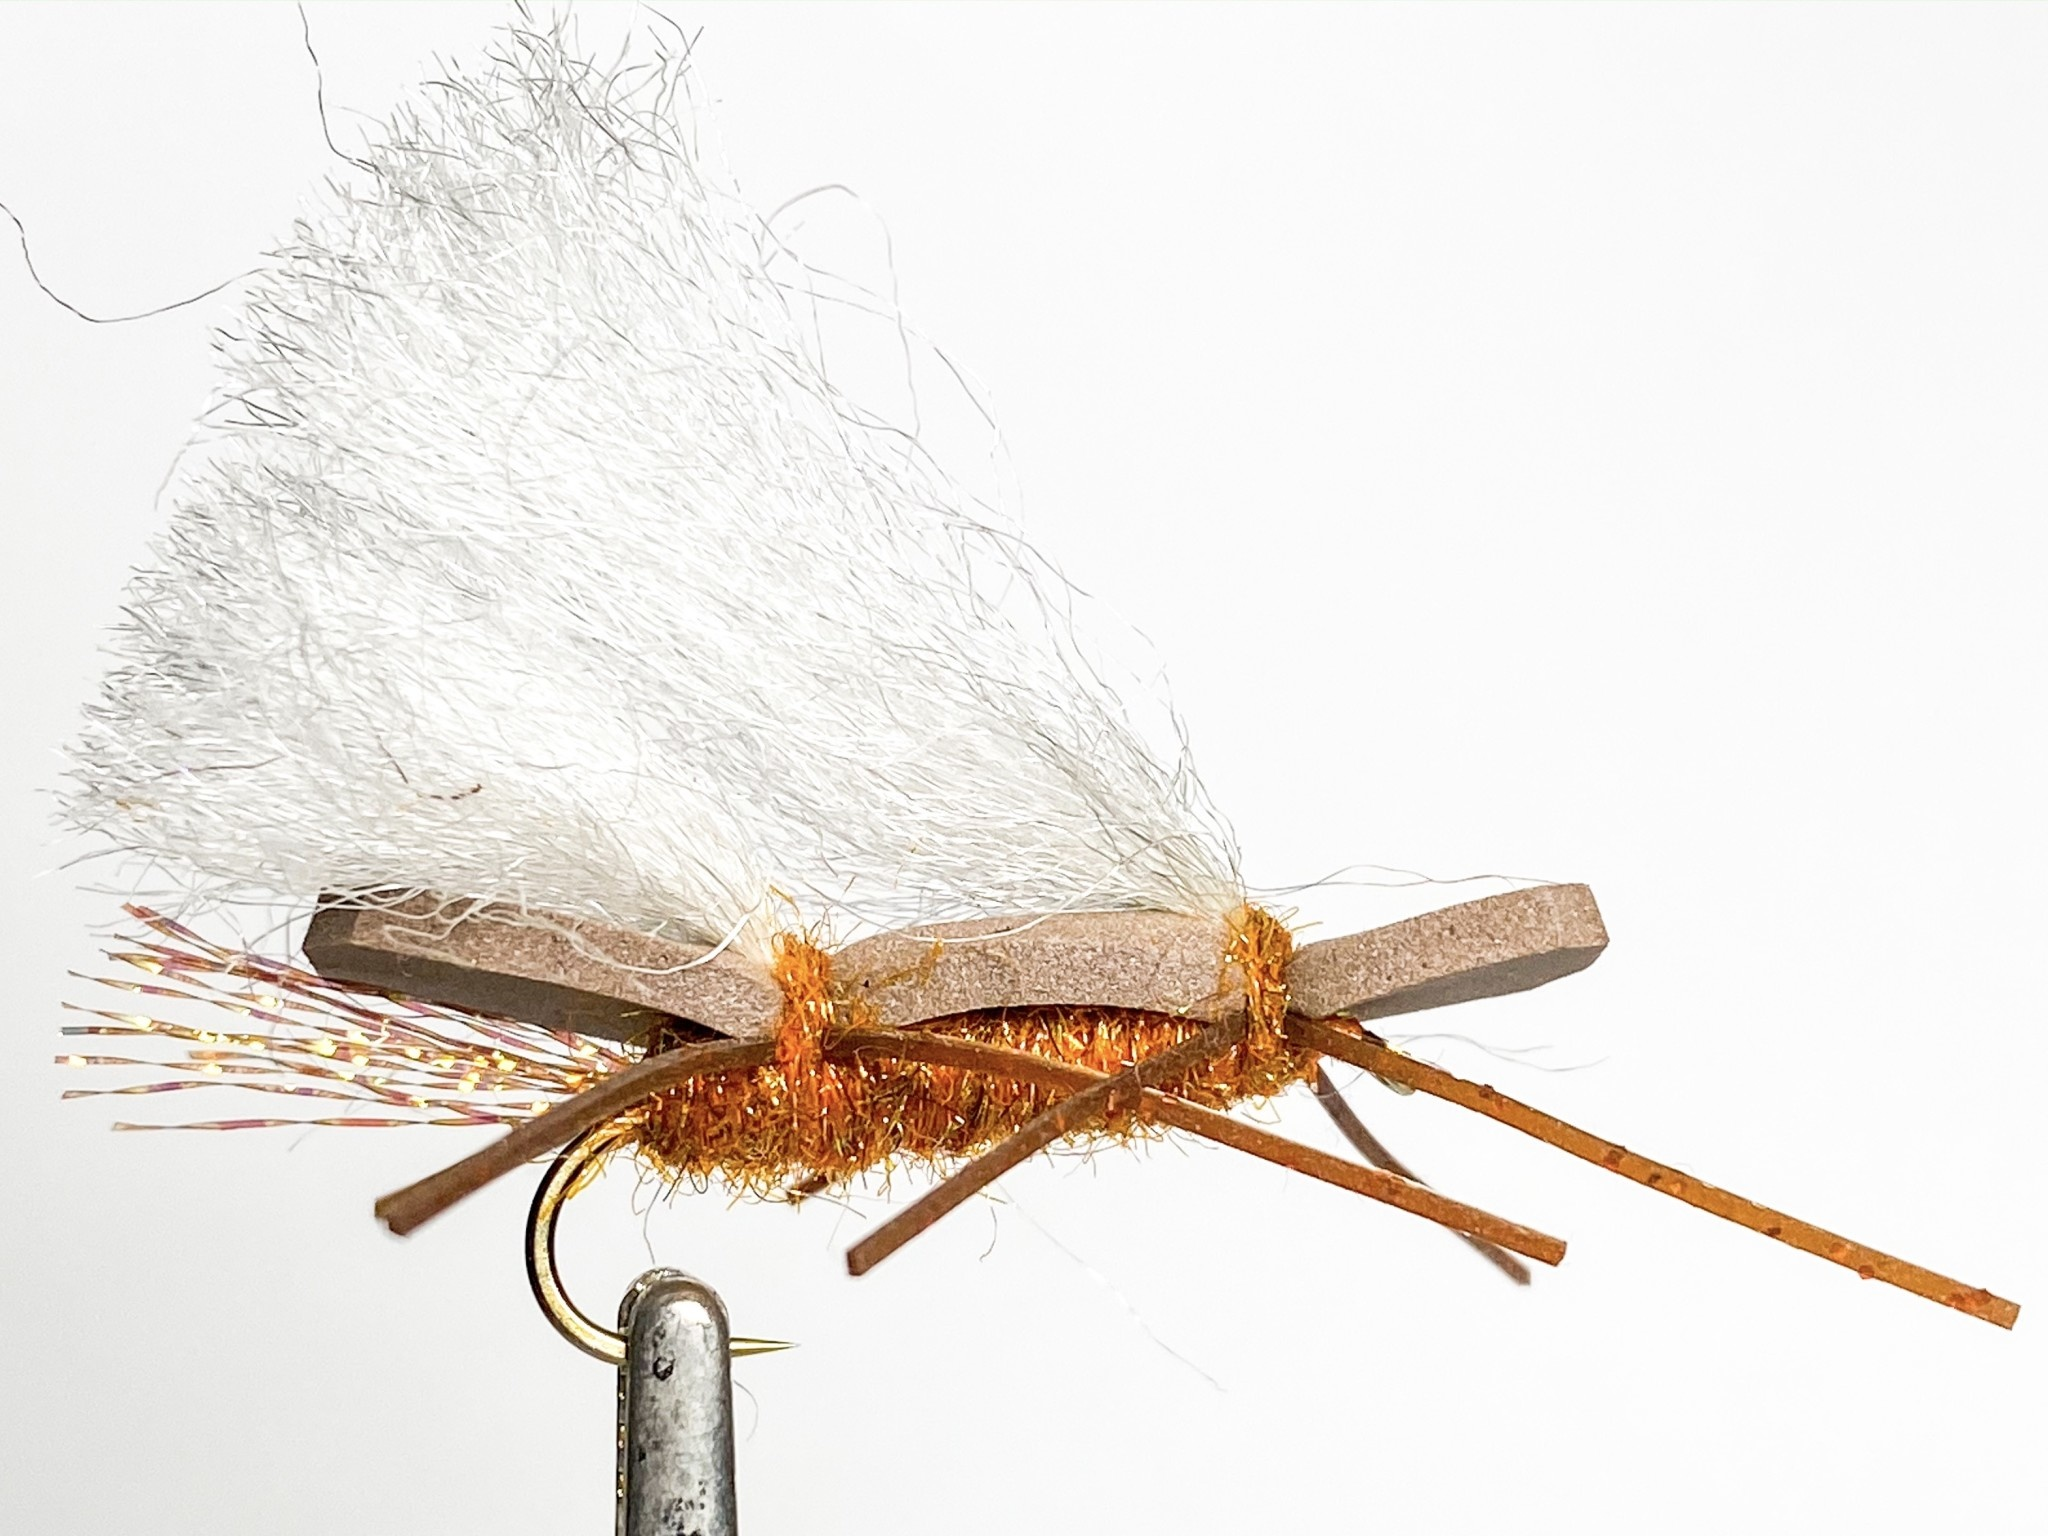 Catch Flies Chubby Chernobyl Pteronarcys